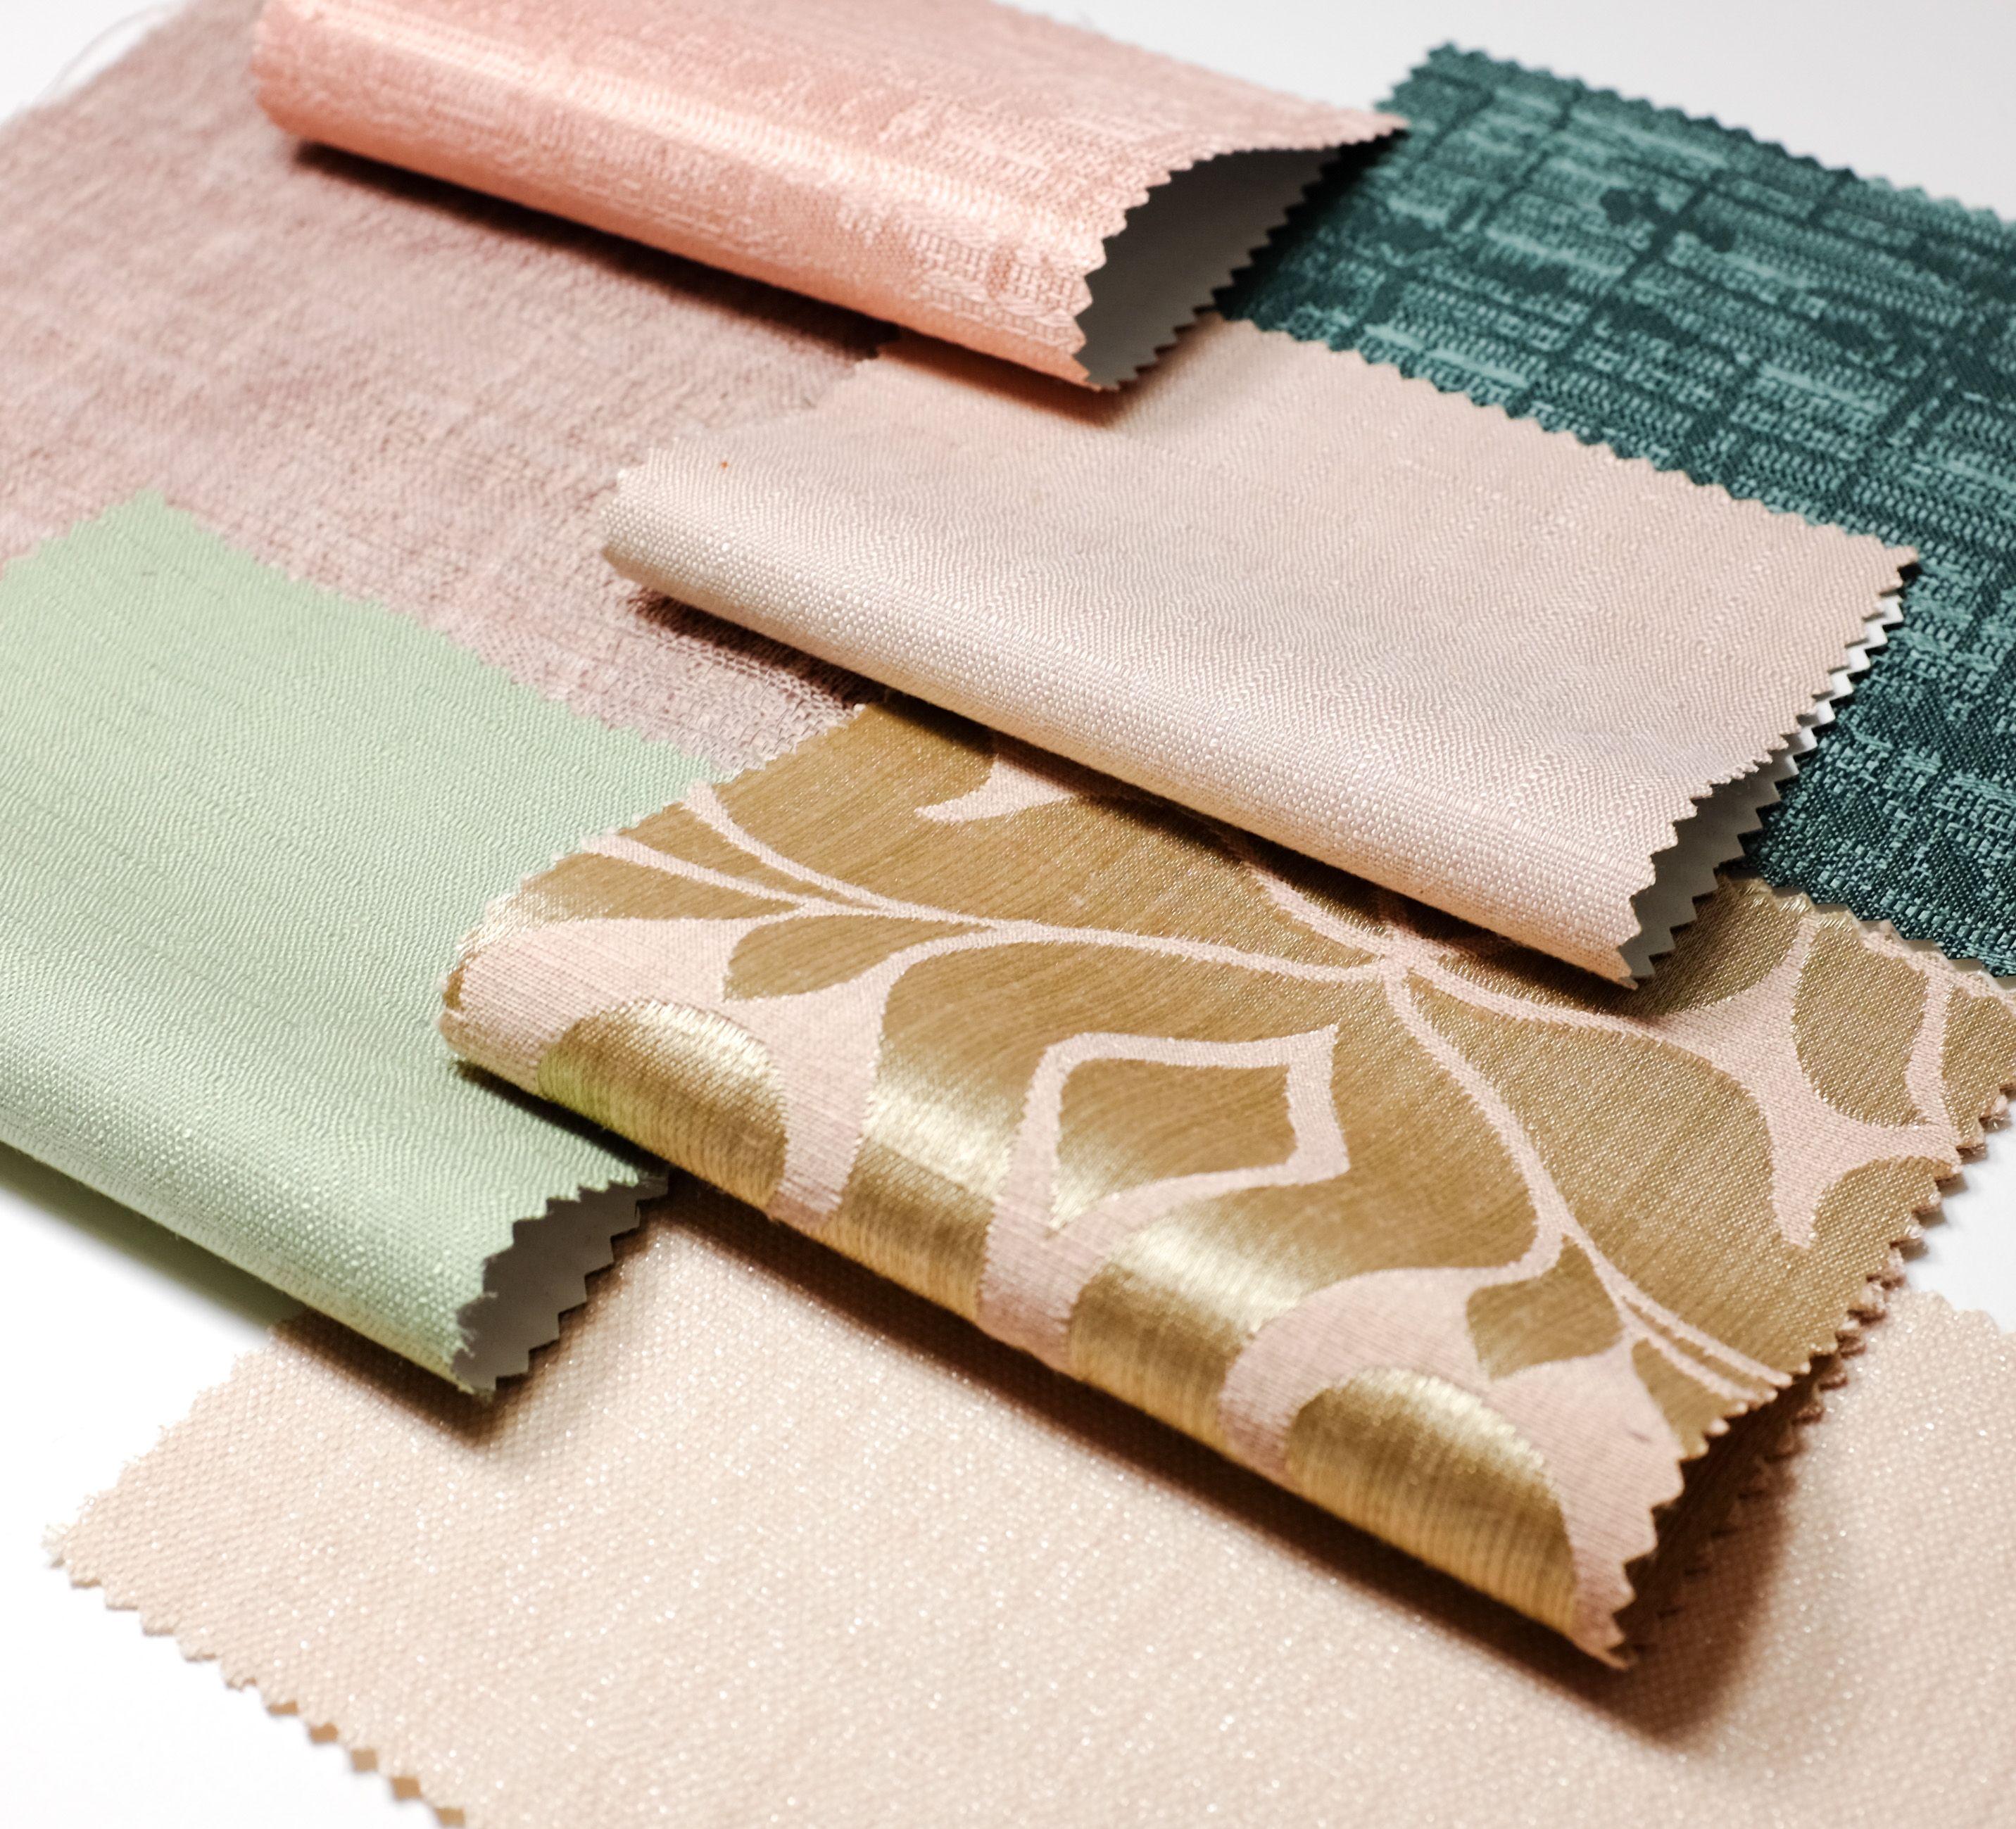 Wilson Fabrics Drapery Moodboard Fabric Textiles Curtains Drapery Pink Green Pastel Moodboard Flatlay Buy Fabric Online Buy Fabric Fabric